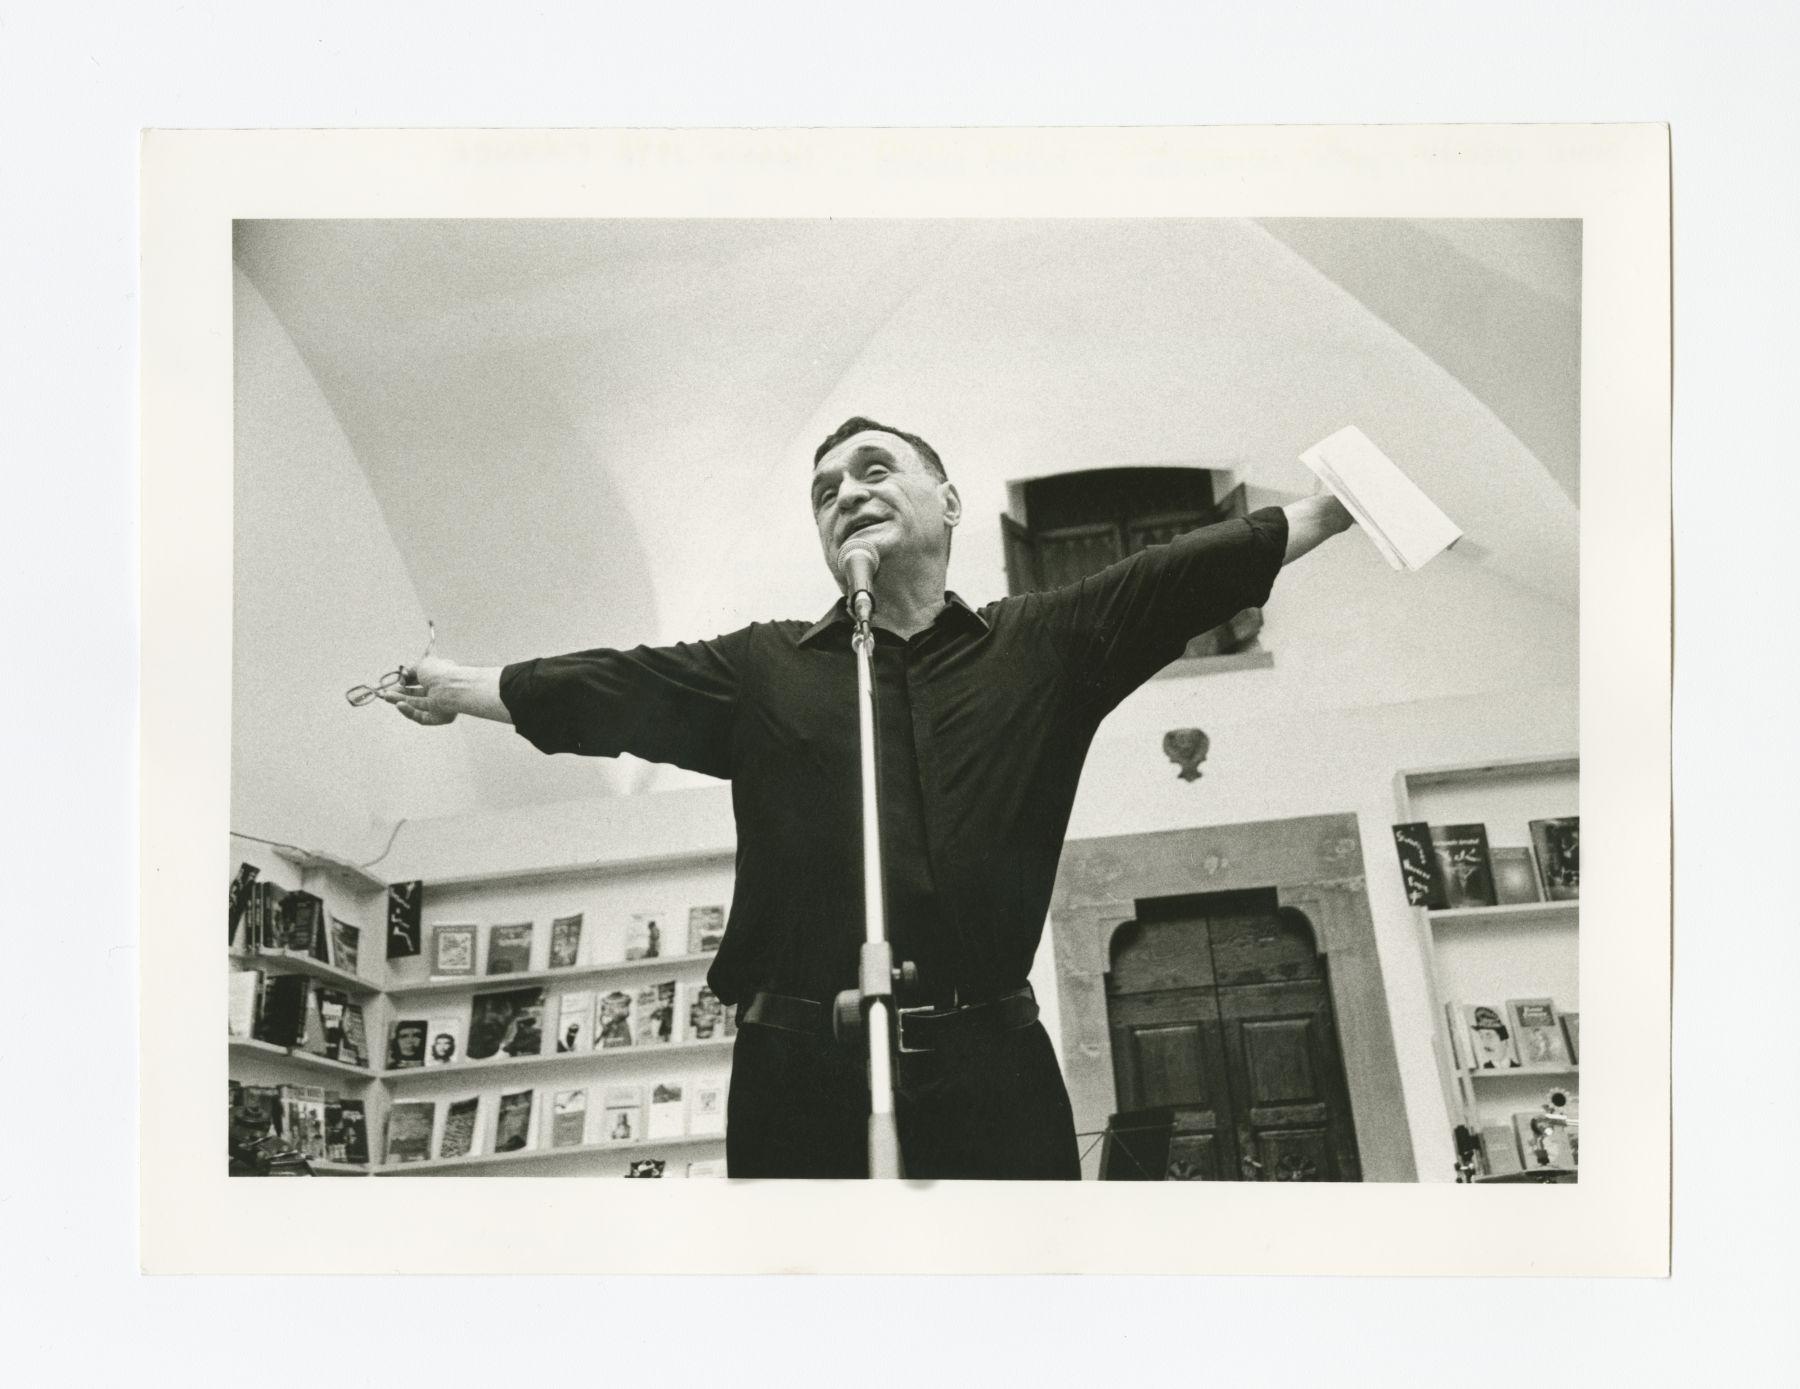 John Giorno performing at City Lights Italia Festival. Florence, Italy, May 4 1998